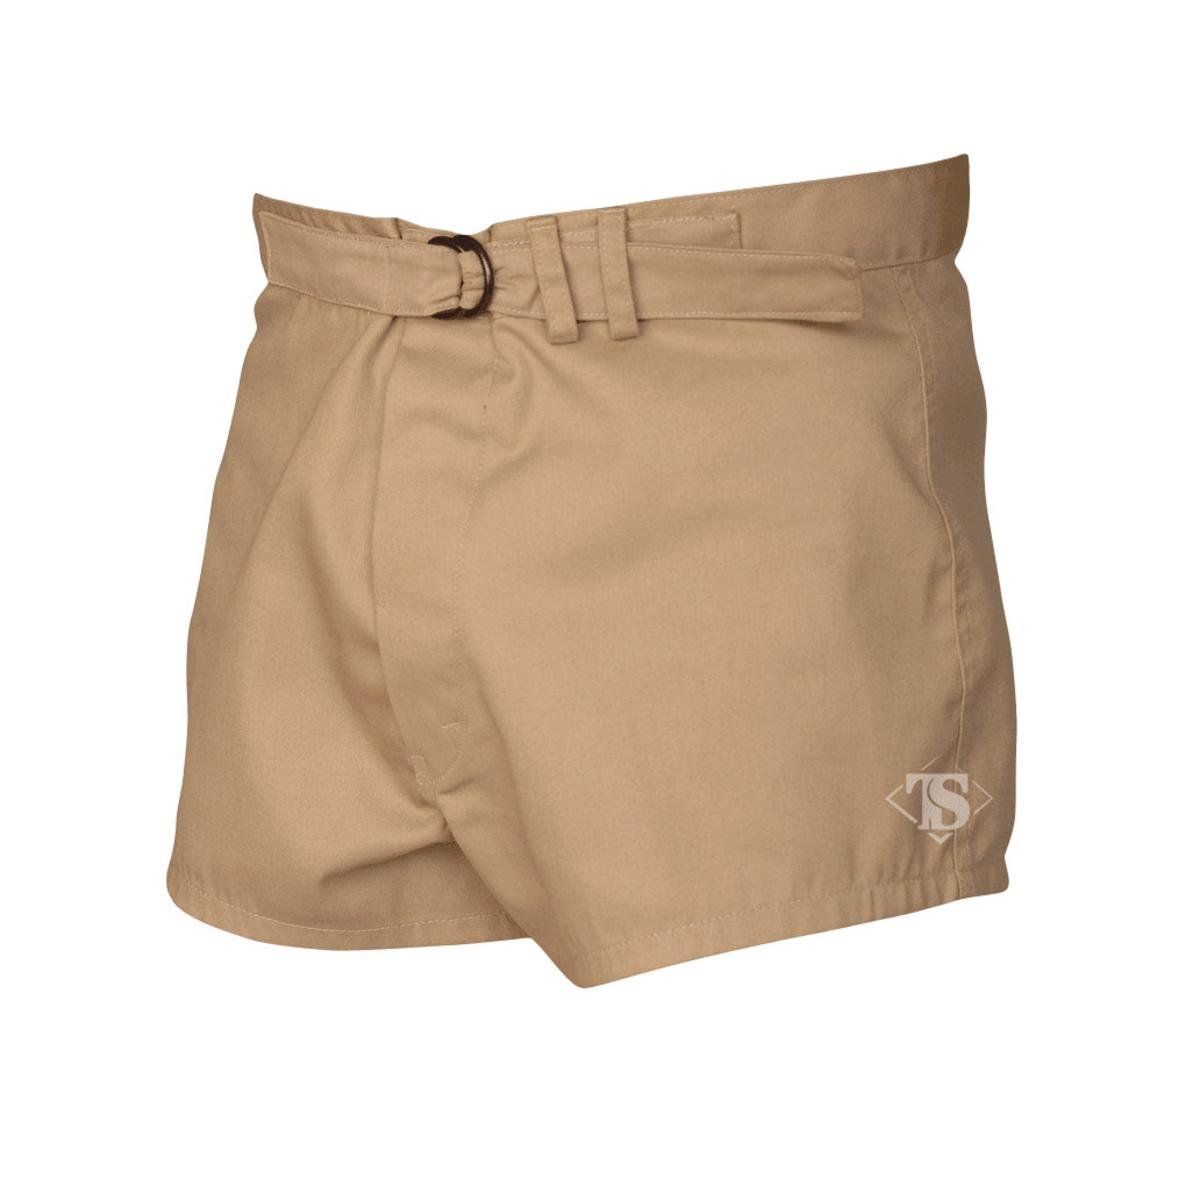 Tru-Spec Tru-Short en coton/polyester, 40 4224006 Udt